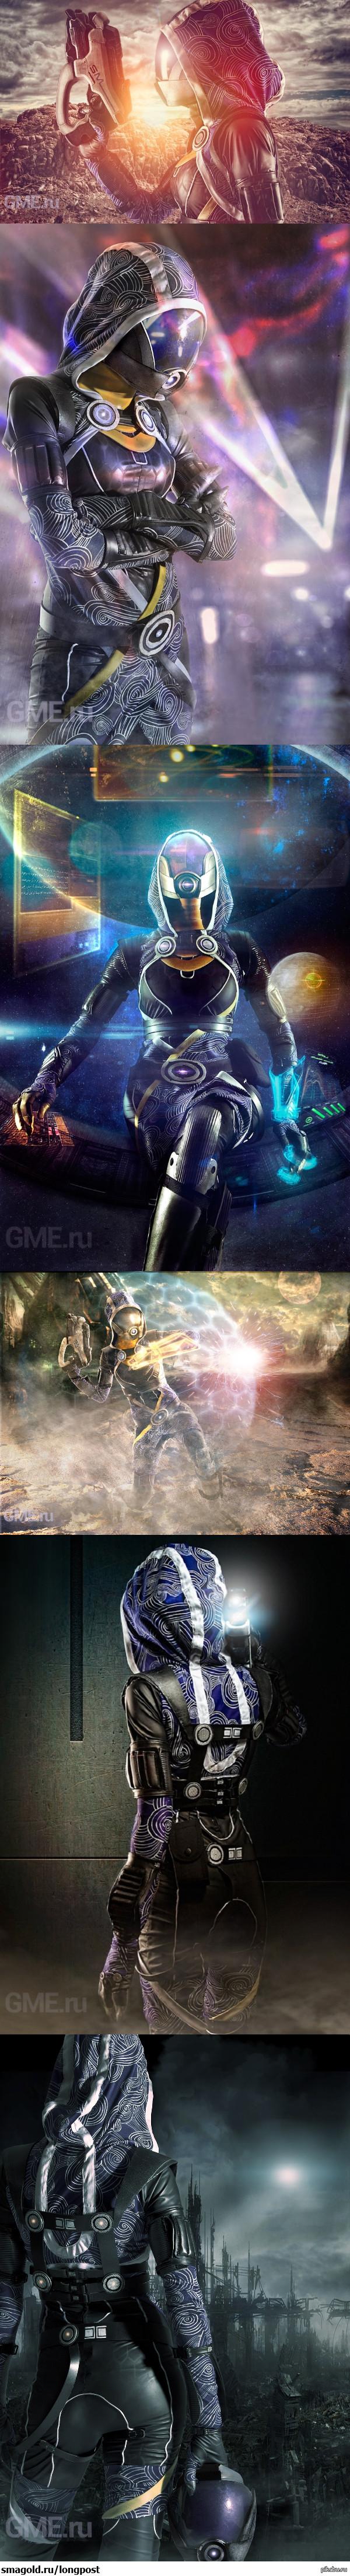 Tali'Zorah nar Rayya Cosplay Tali'Zorah nar Rayya from «Mass Effect»    Исполнители косплея: Nebulaluben и Erikku-kun  Фотография и обработка: Hidrico